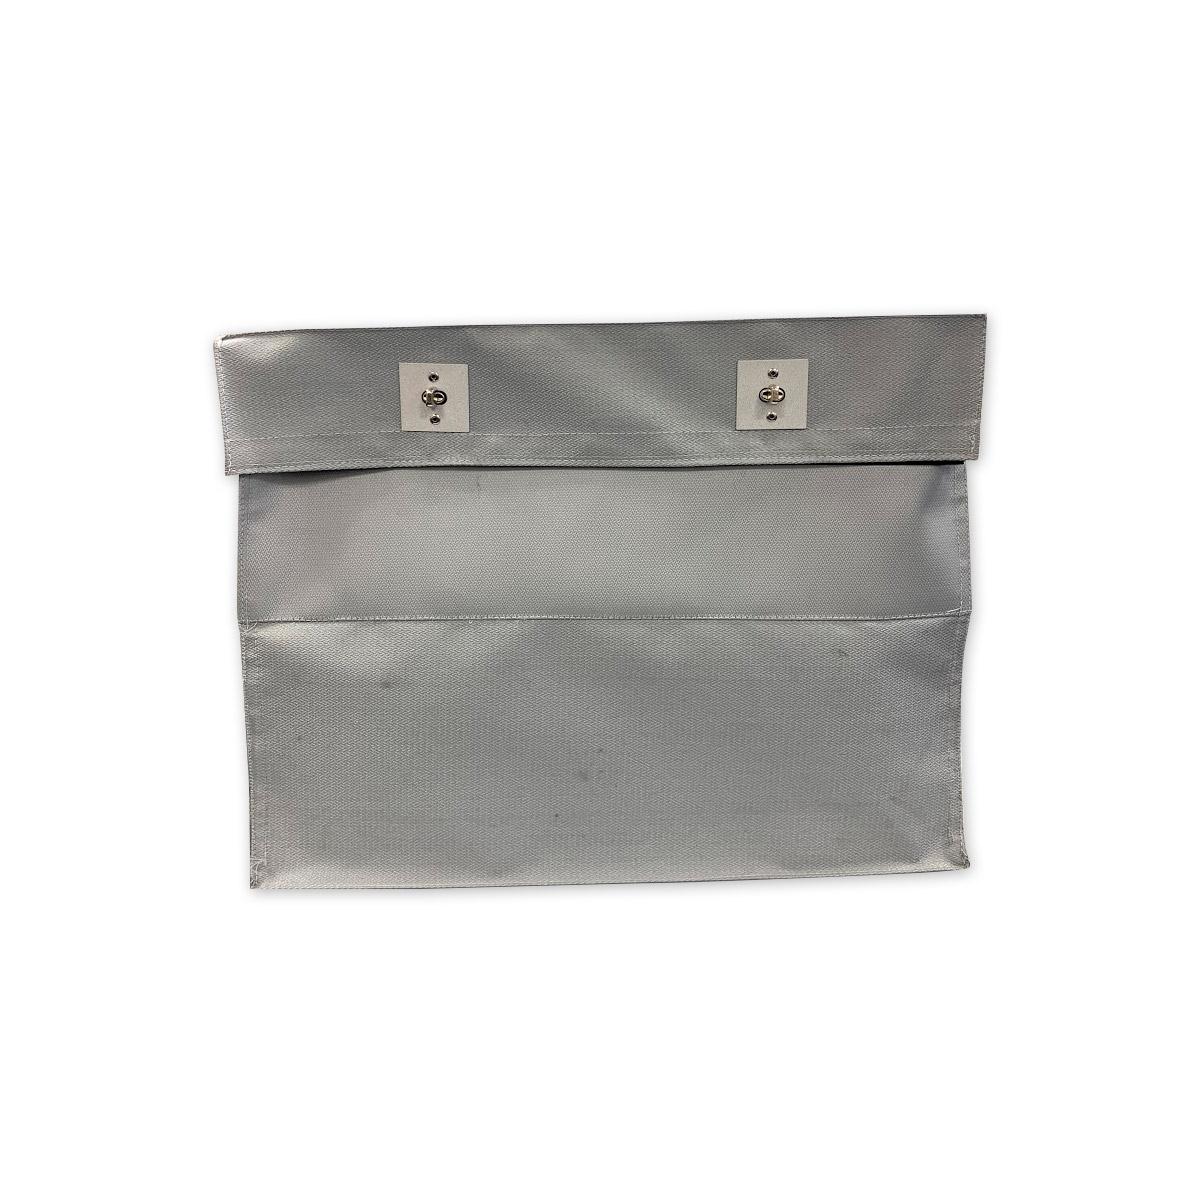 brandwerende zak voor brievenbus